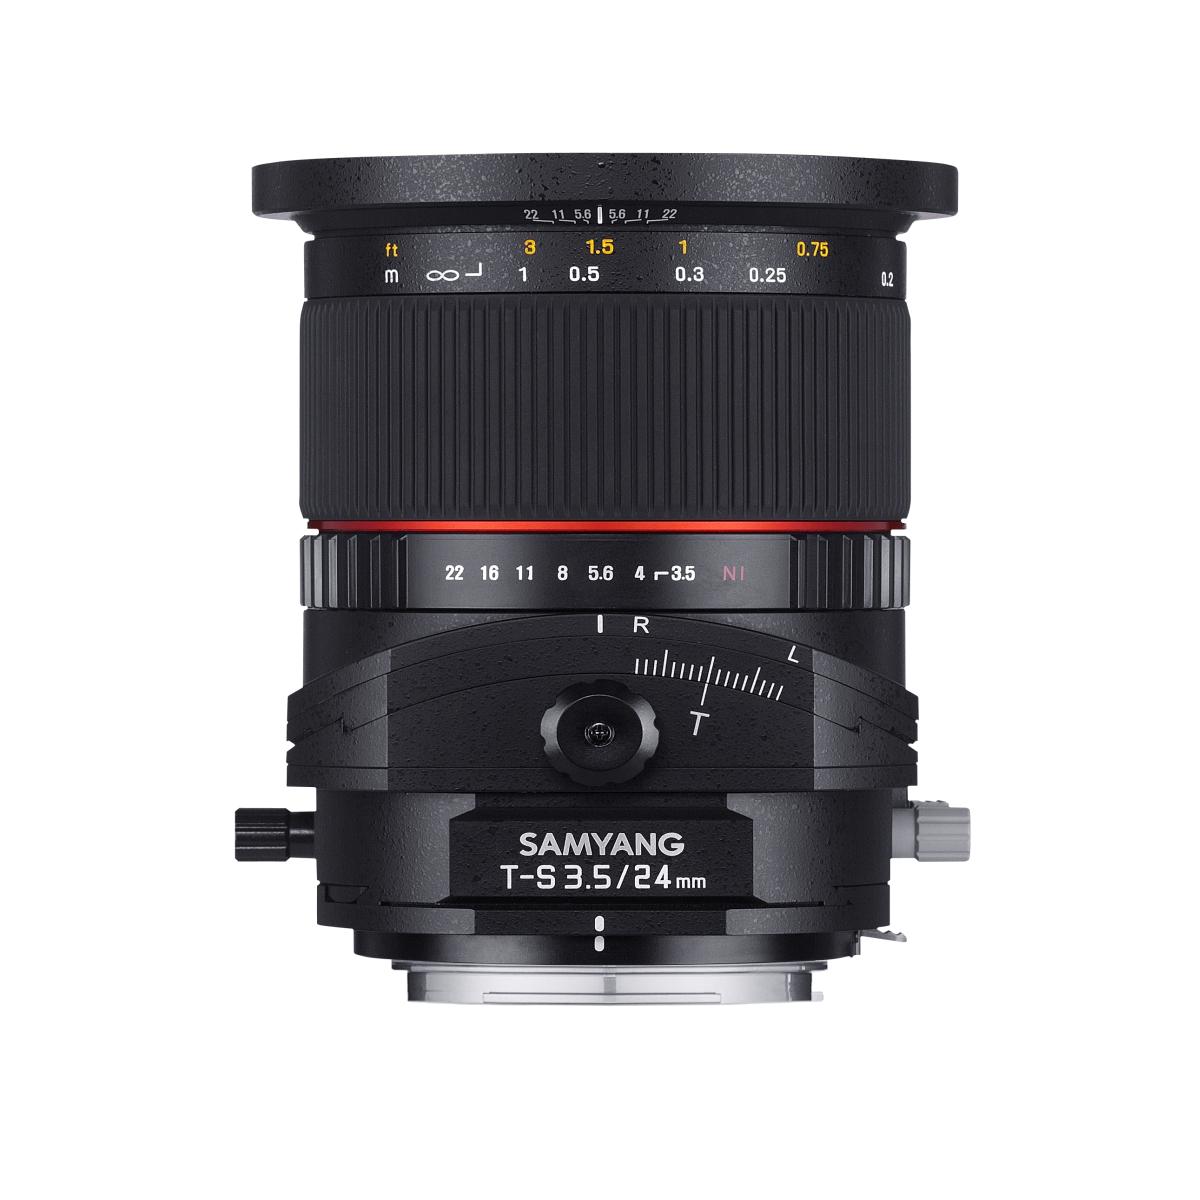 Samyang Tilt-Shift 24 mm 1:3,5 für Sony A